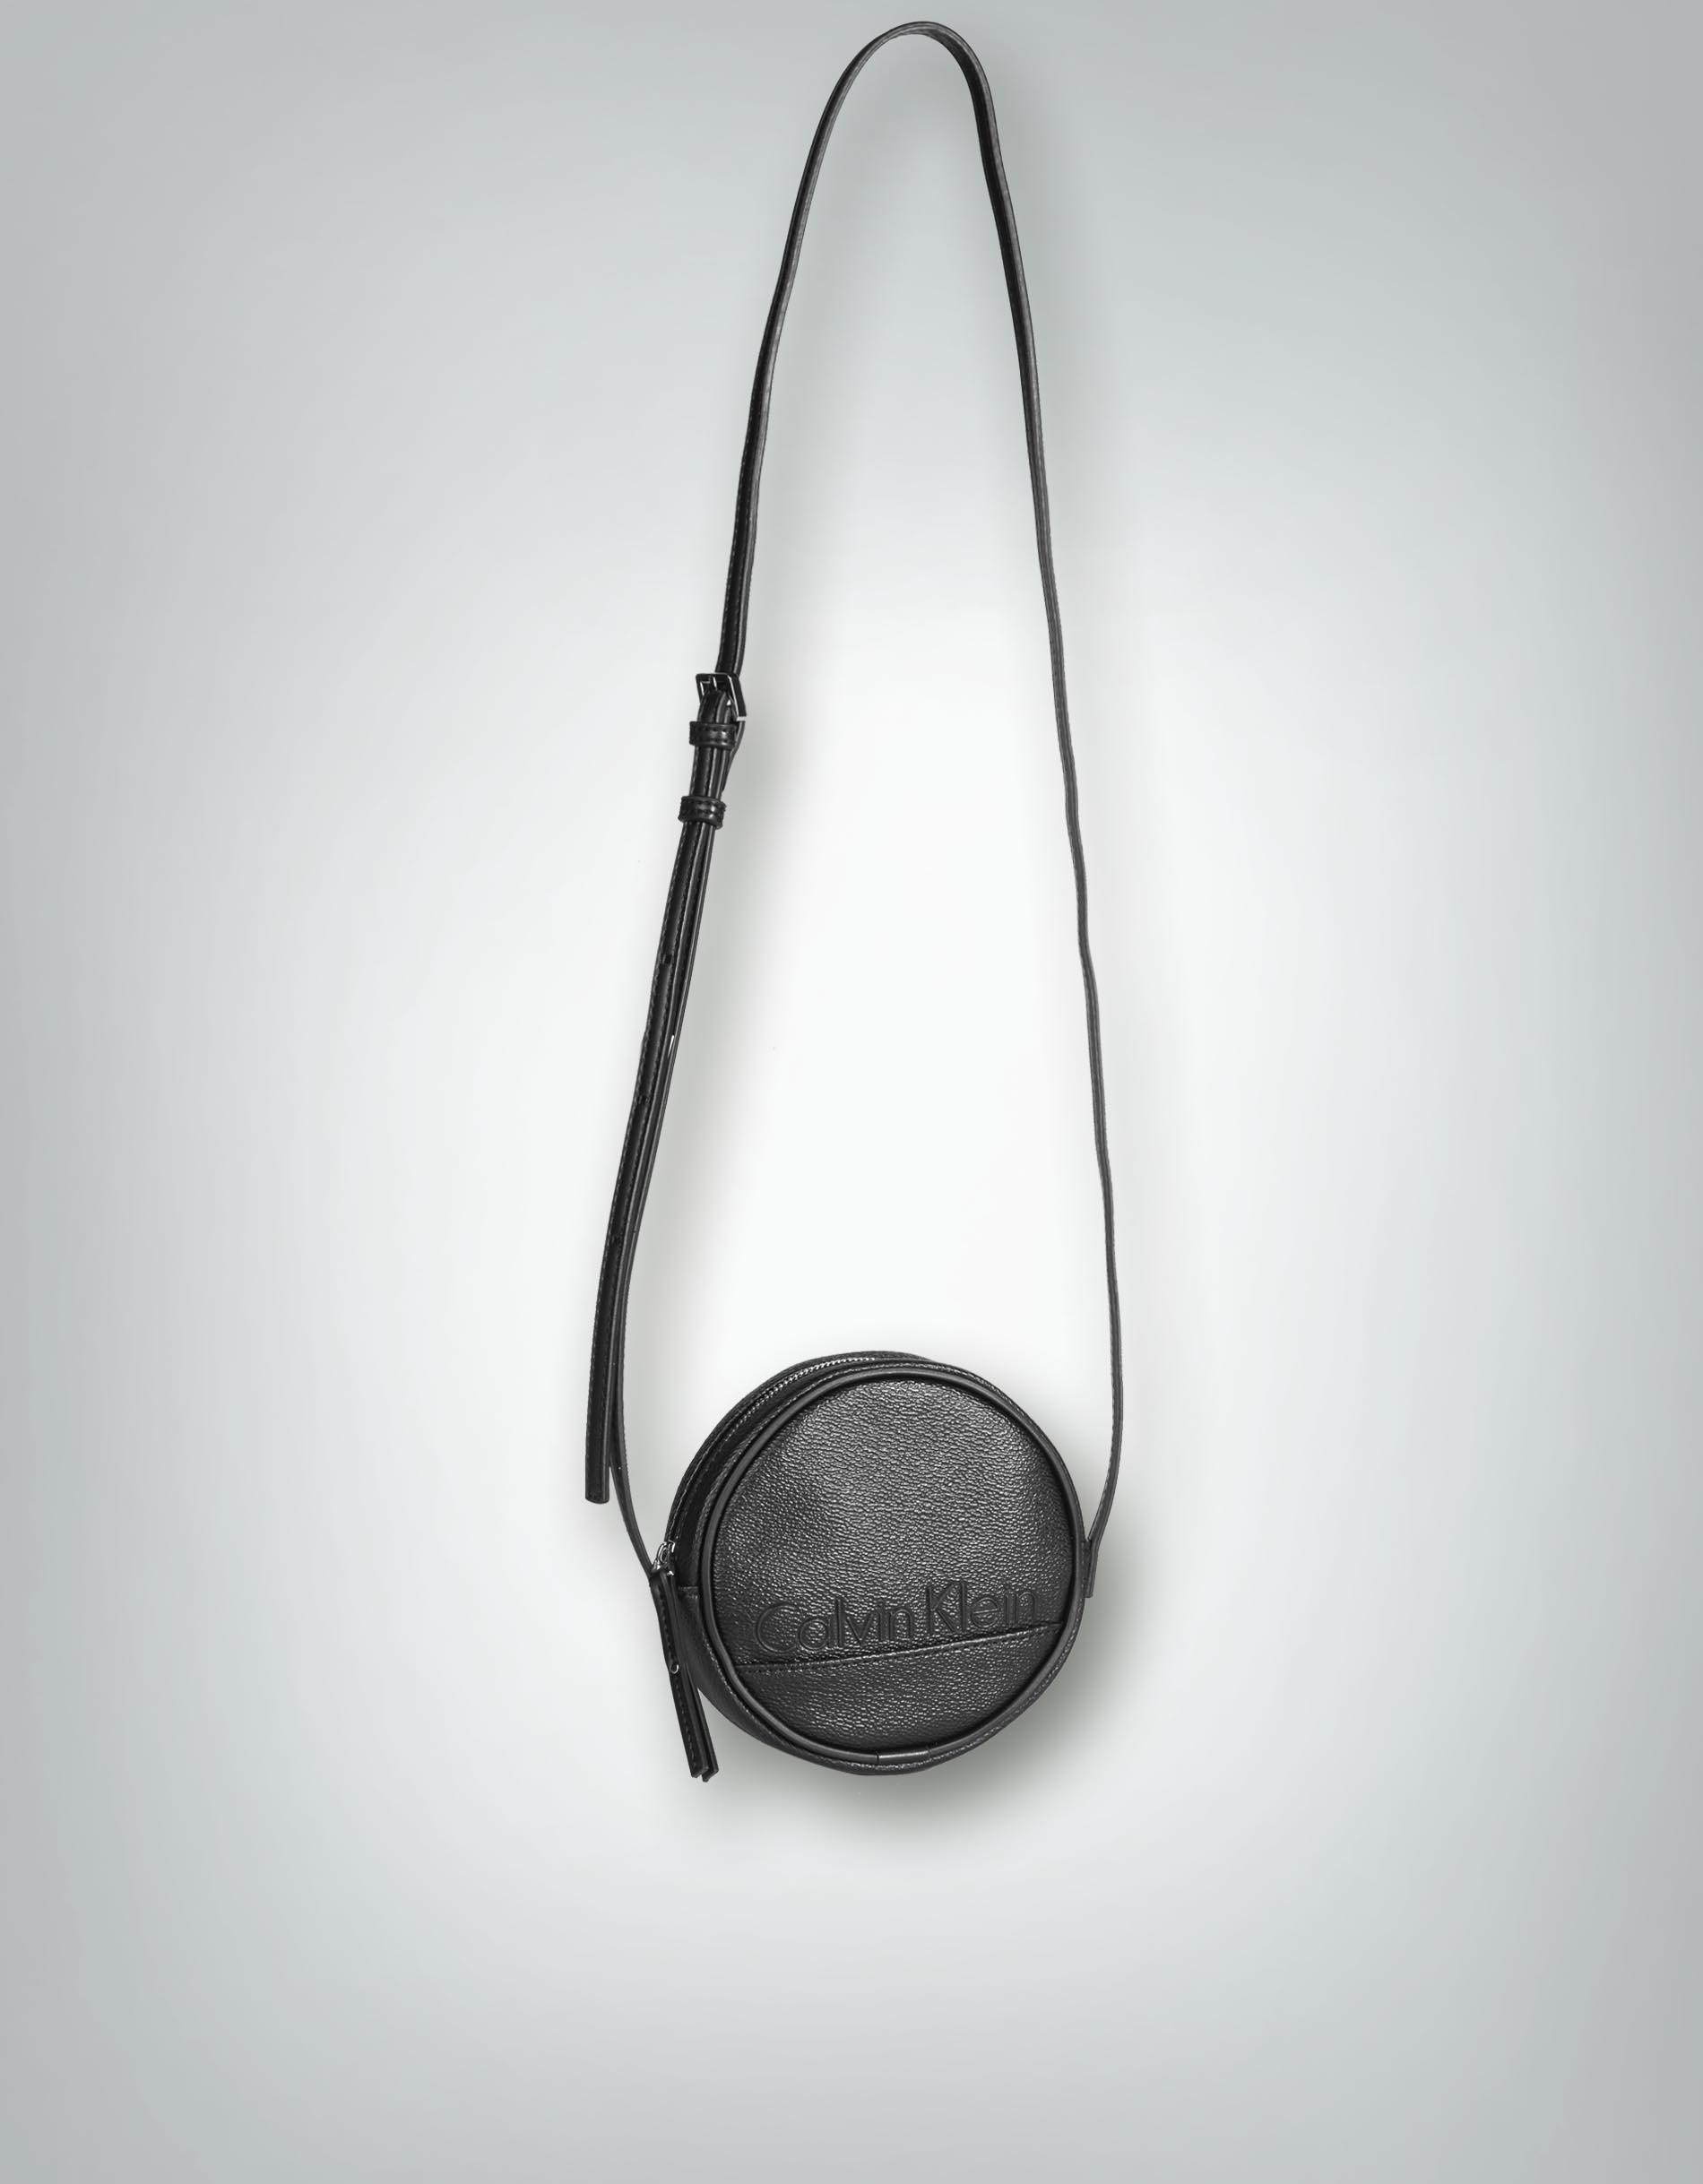 55b82d94b2720 Calvin Klein Jeans Damen Mini Bag -Umhängetasche in genarbter Optik ...